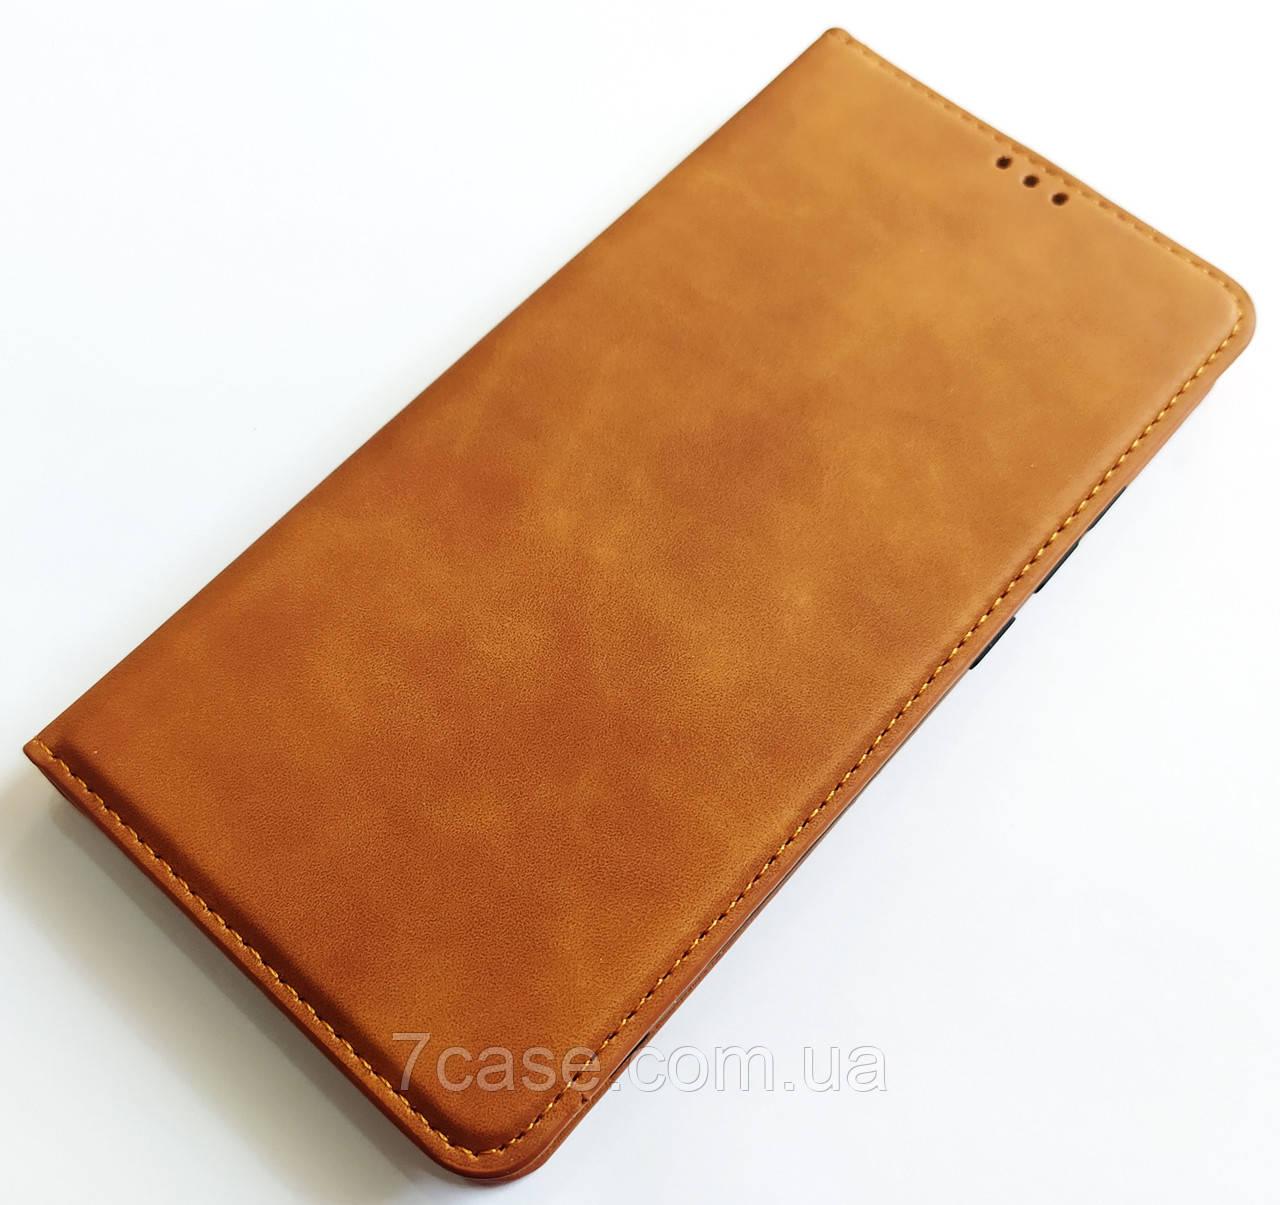 Чехол книжка Leather Book для Xiaomi Redmi 7